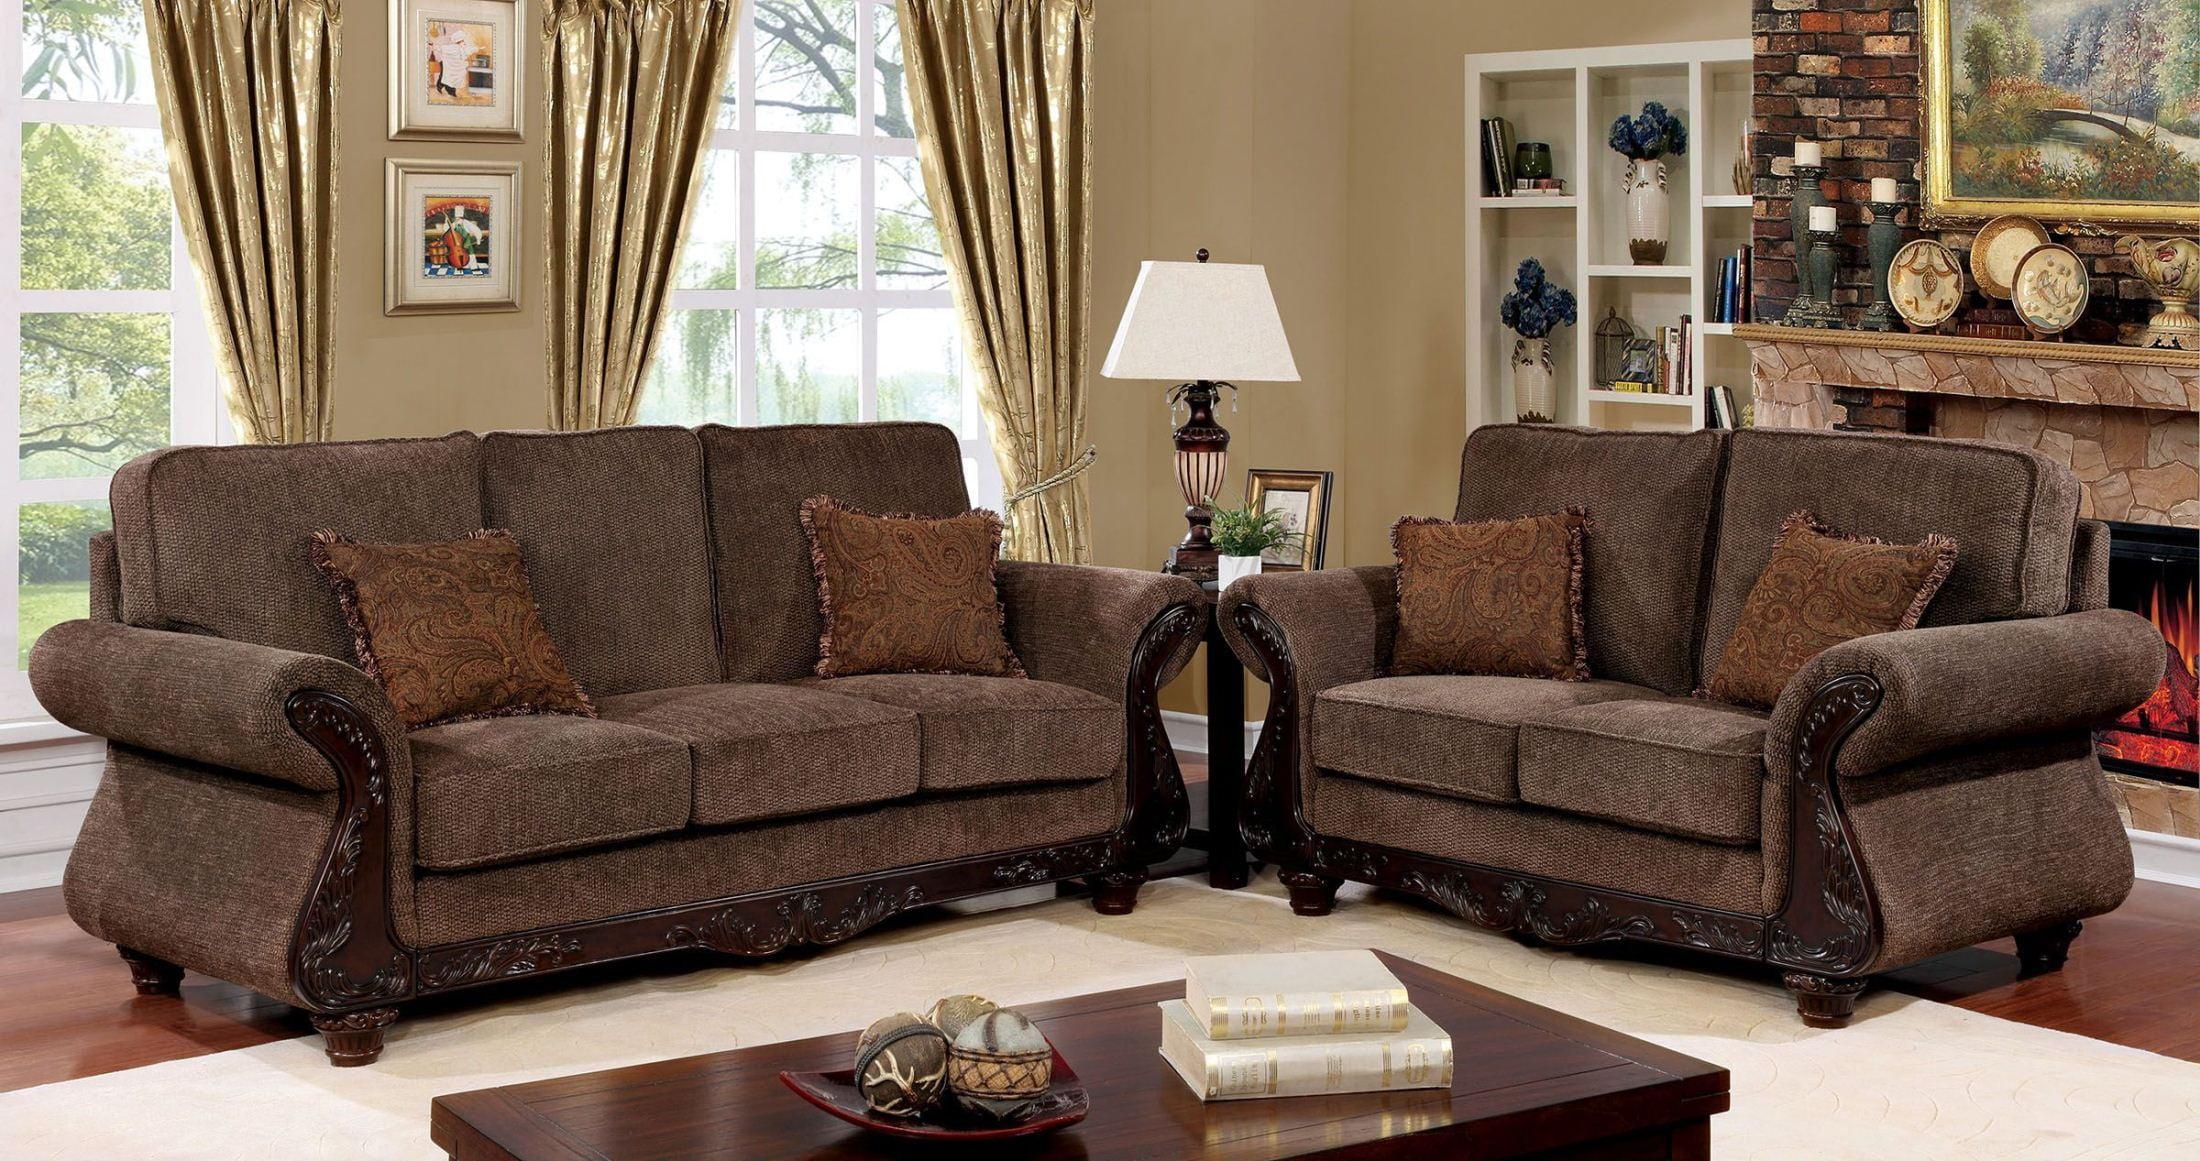 Furniture Of America Margarita Brown And Dark Cherry Living Room Set Margarita Collection 8